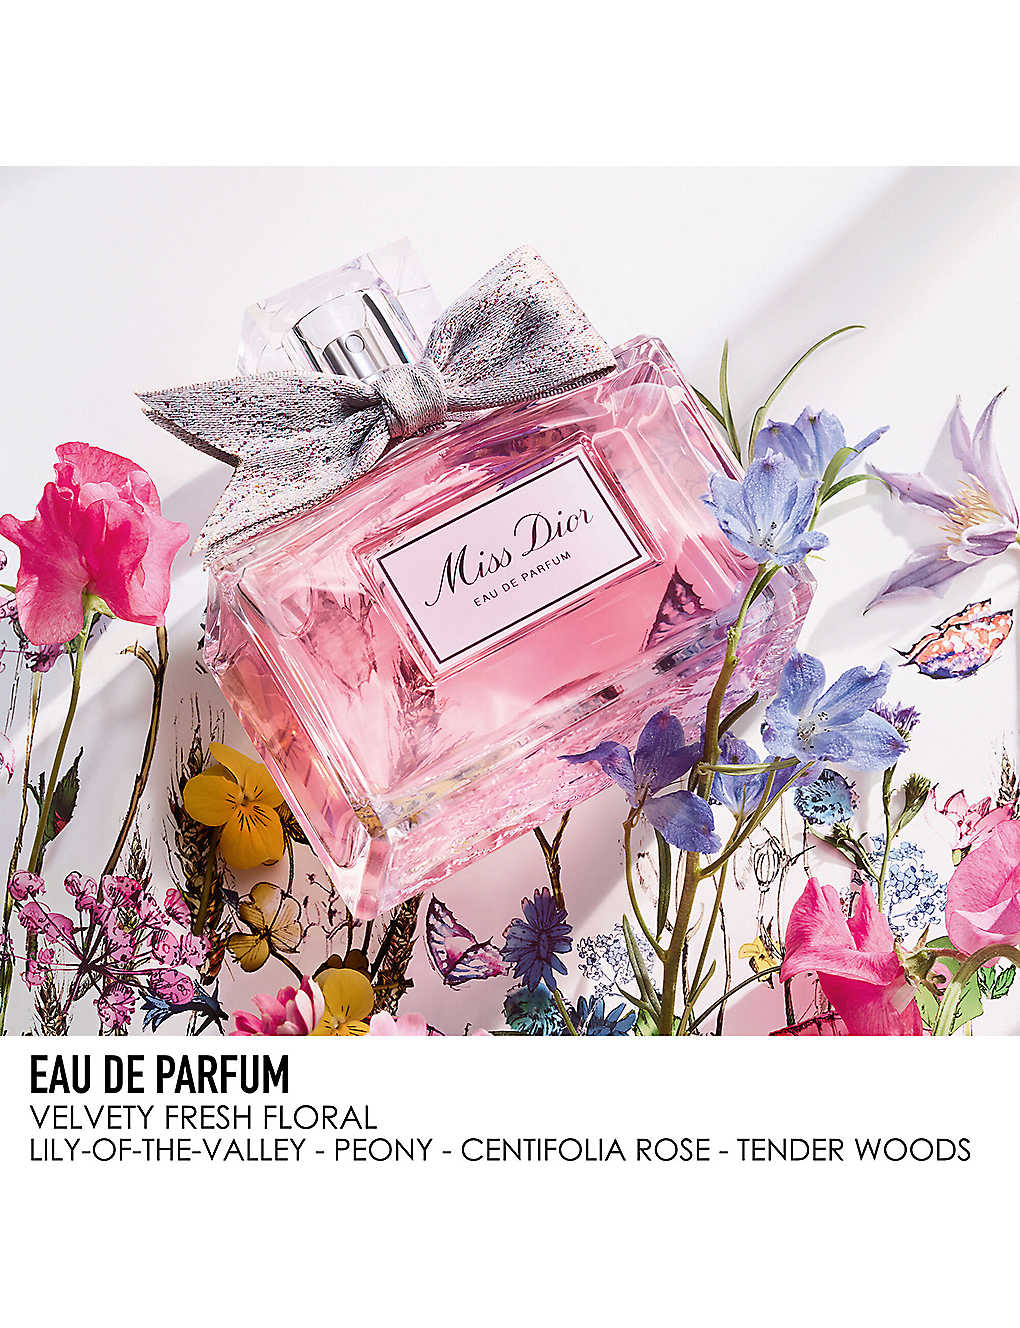 Dior Miss Dior Limited Edition Eau de Parfum